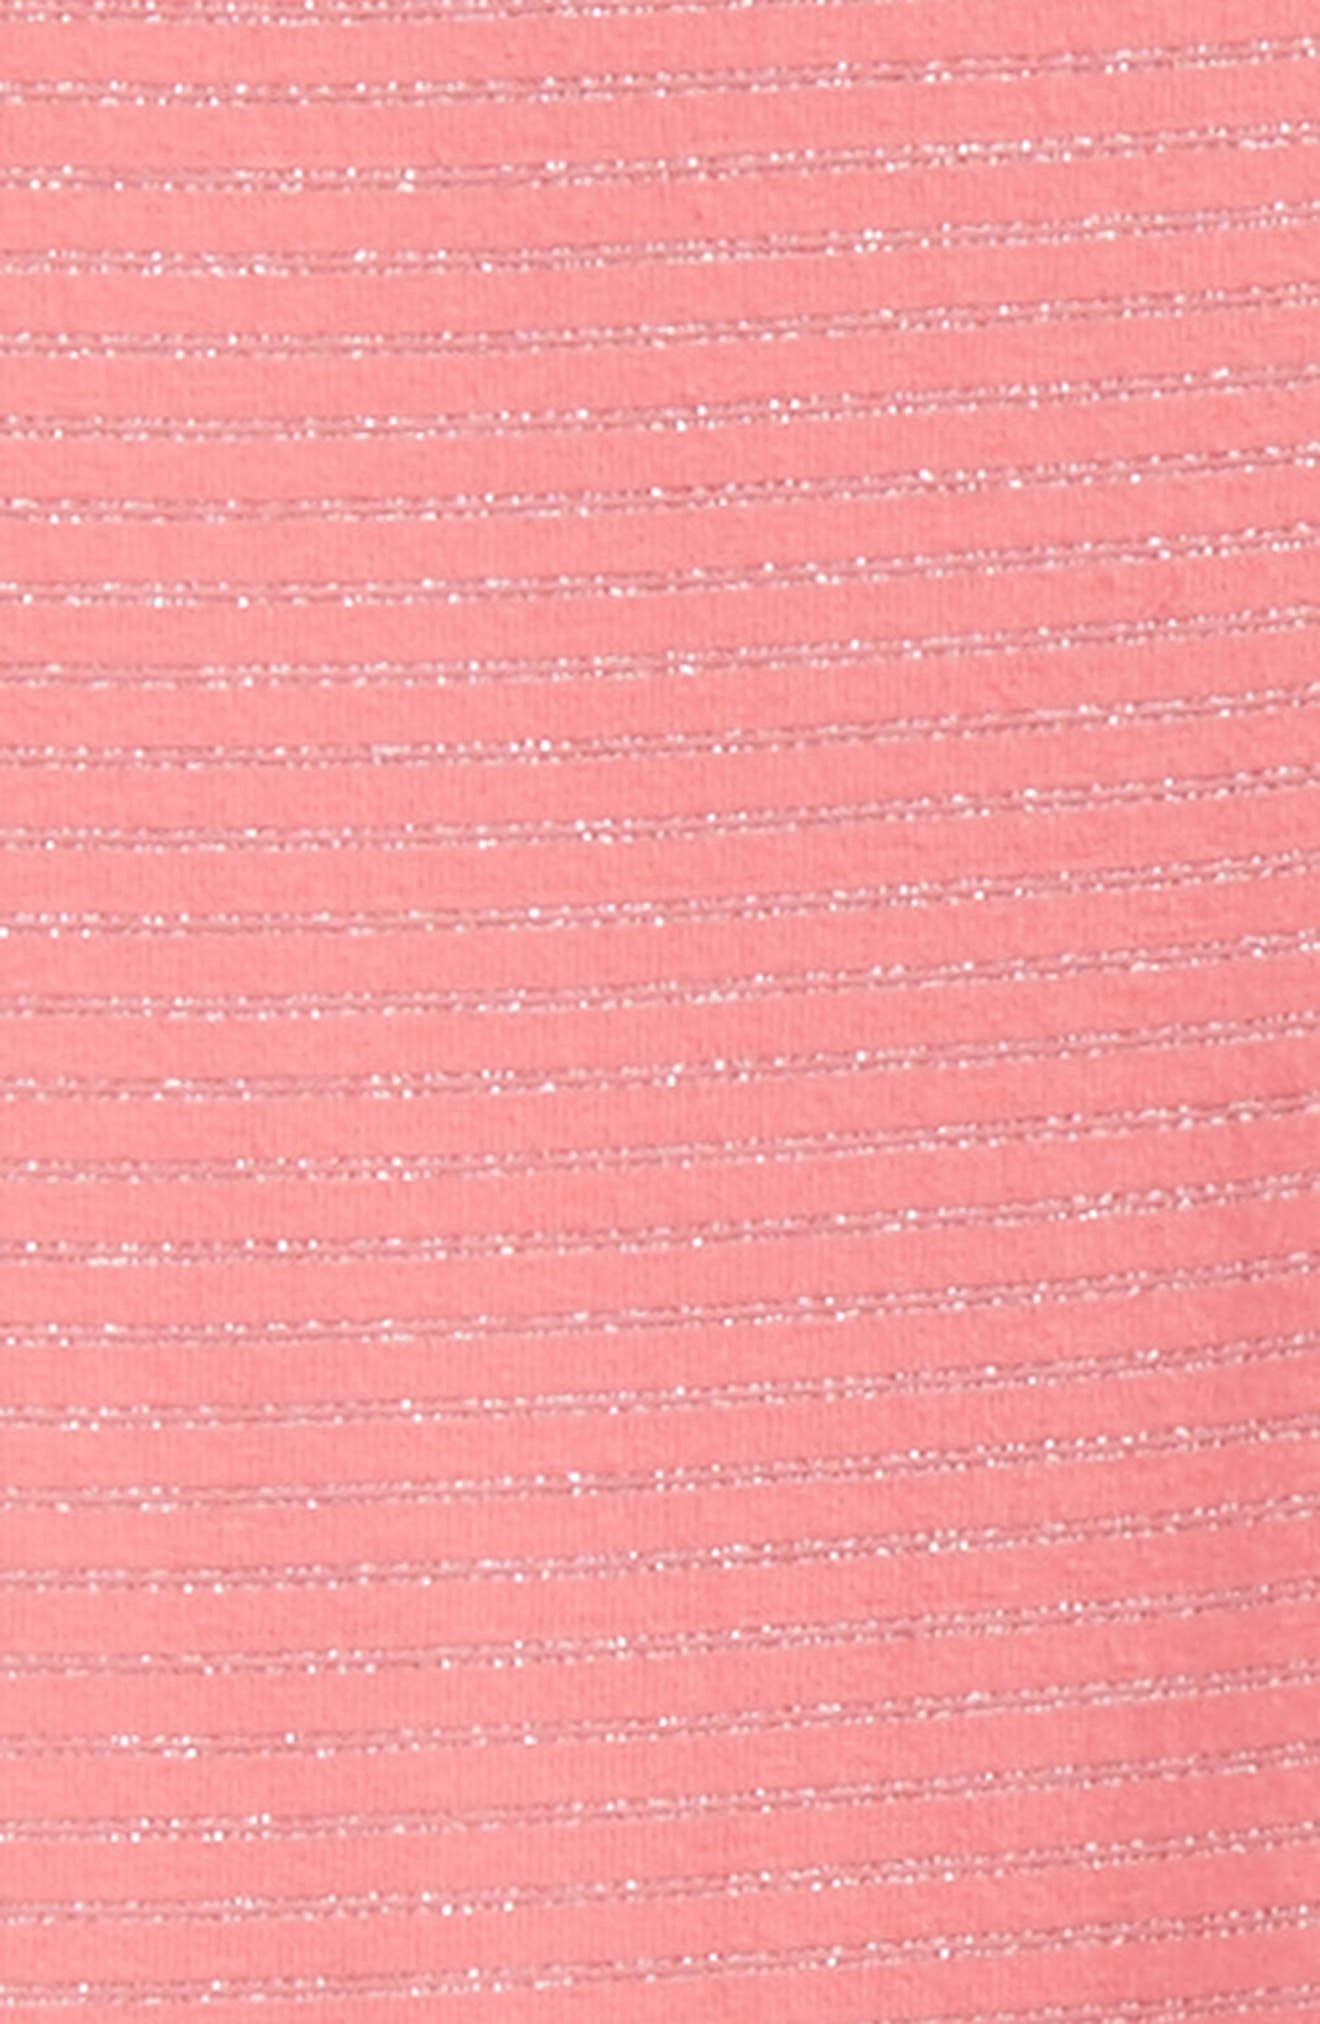 Sparkle Stripe Leggings,                             Alternate thumbnail 2, color,                             Pink Lemonade Sparkle Stripe